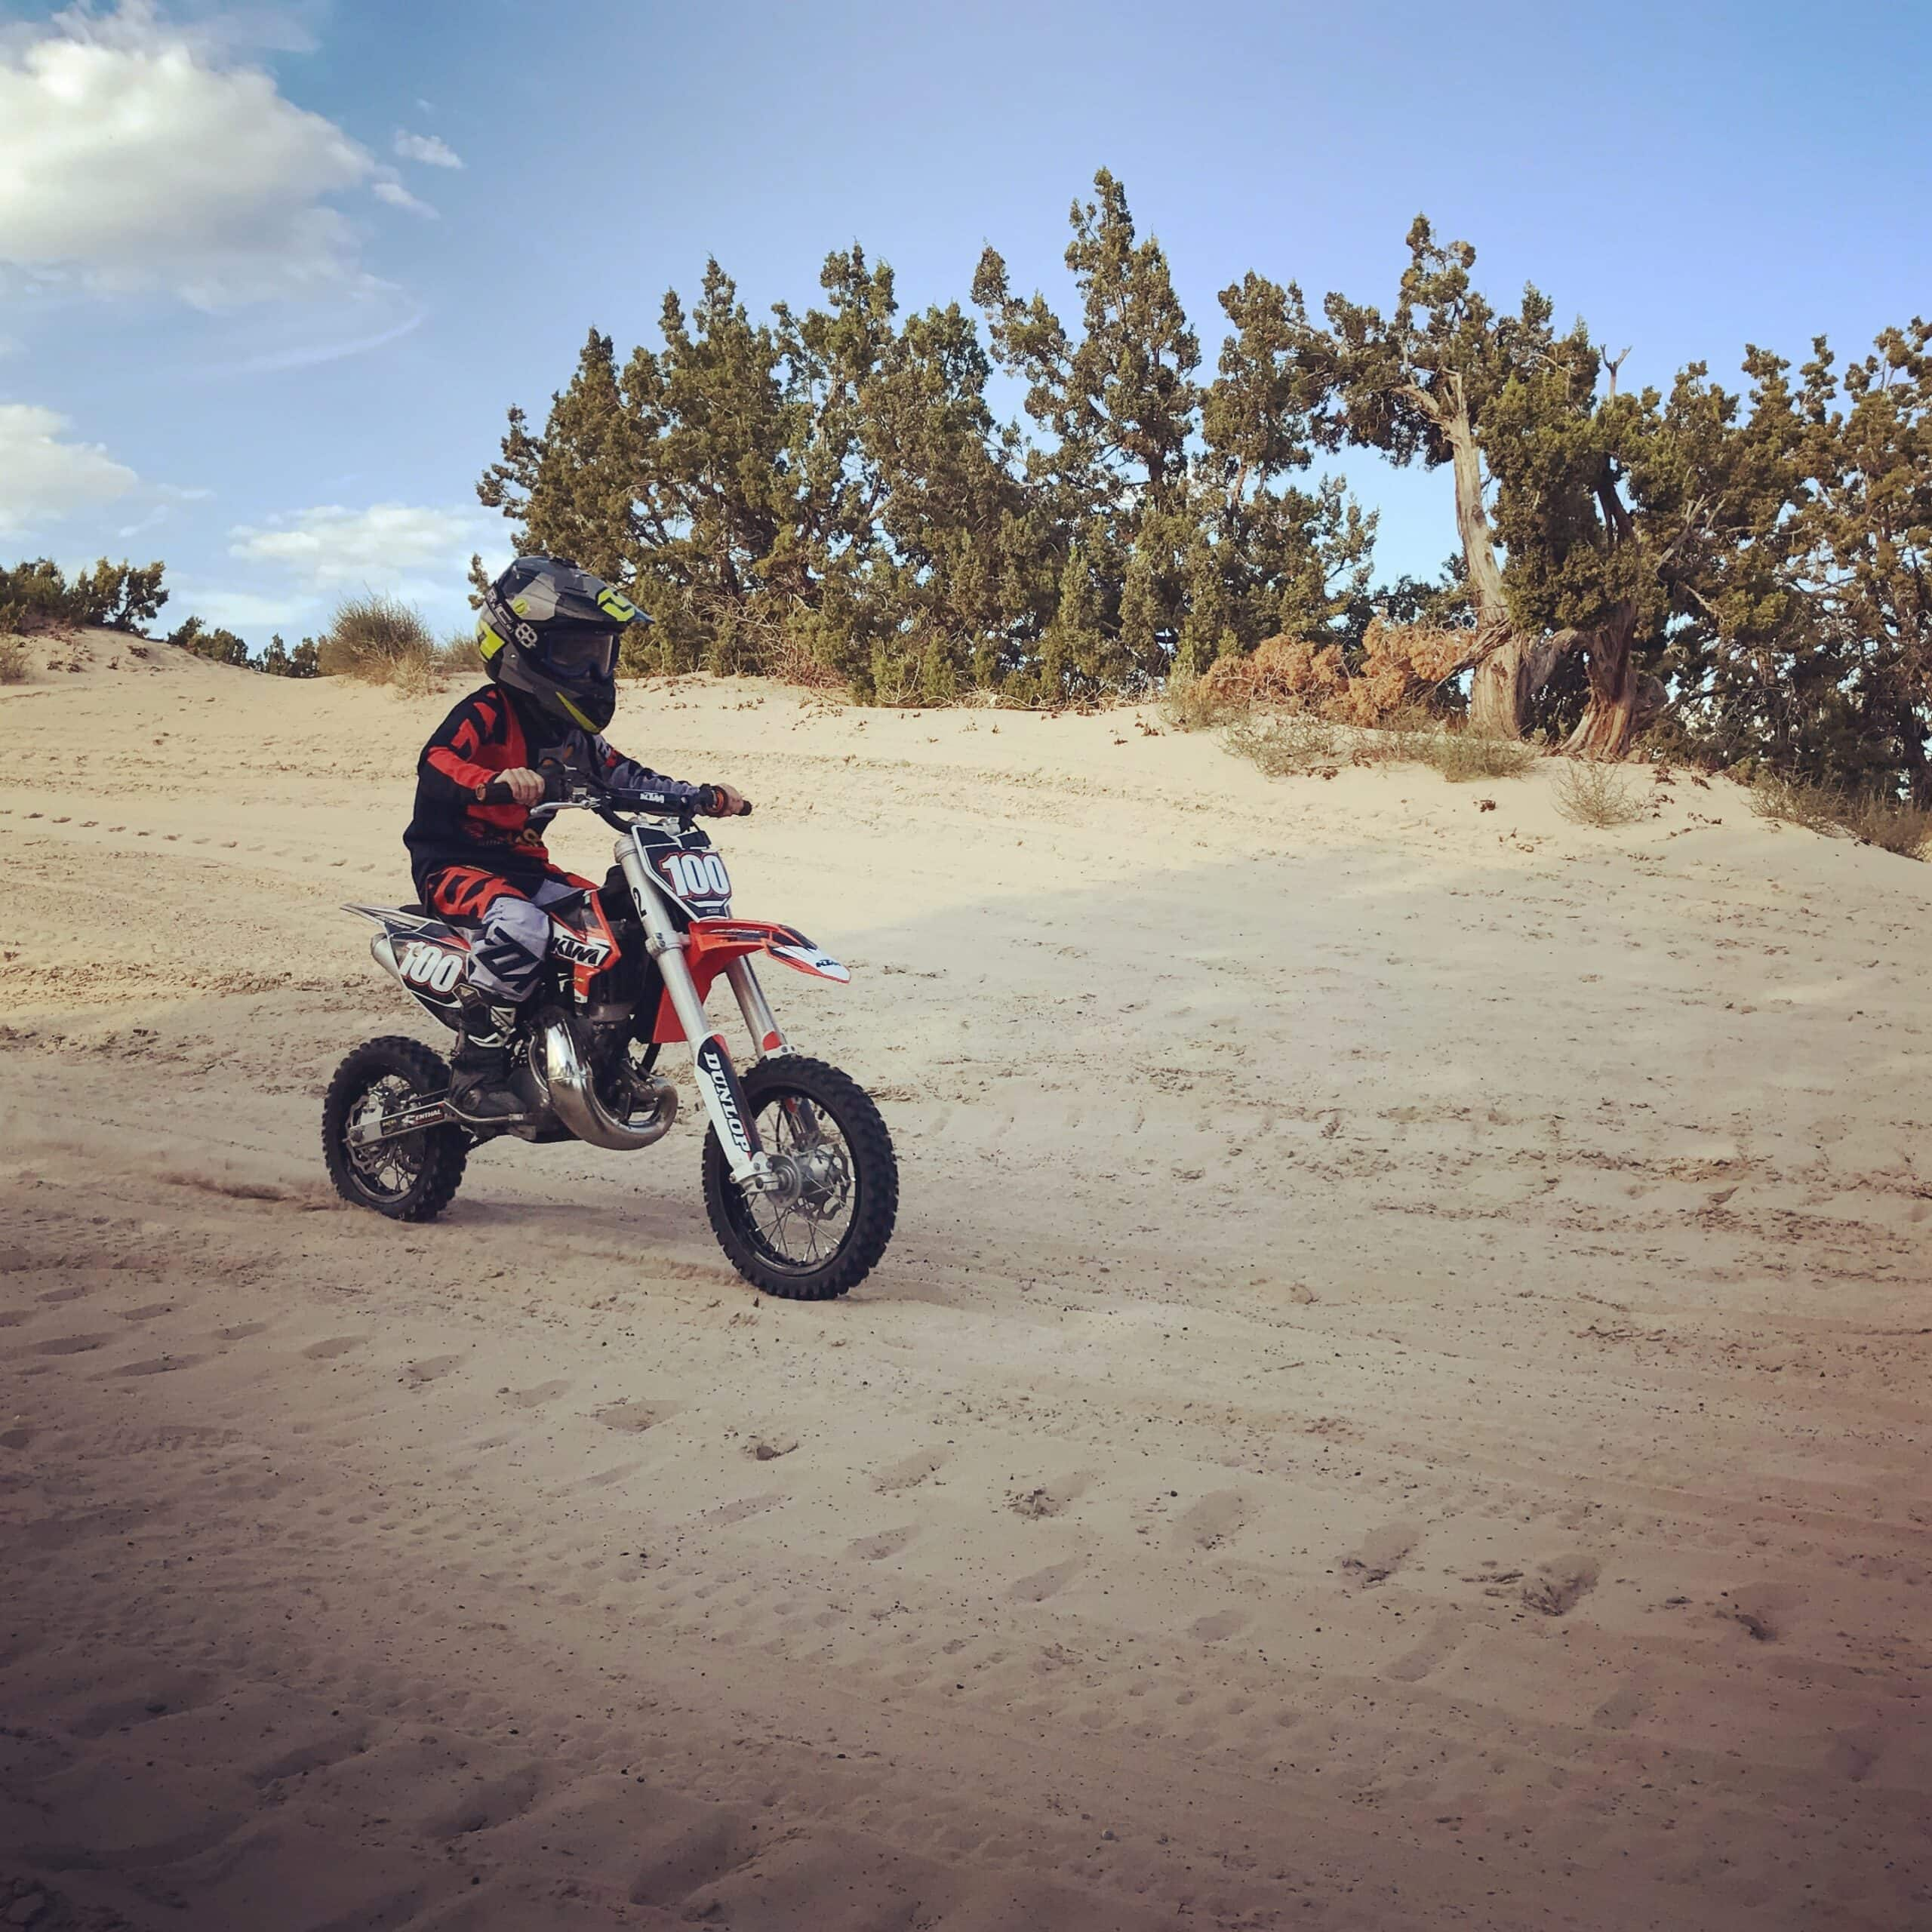 KTM 50 SX dirt bike